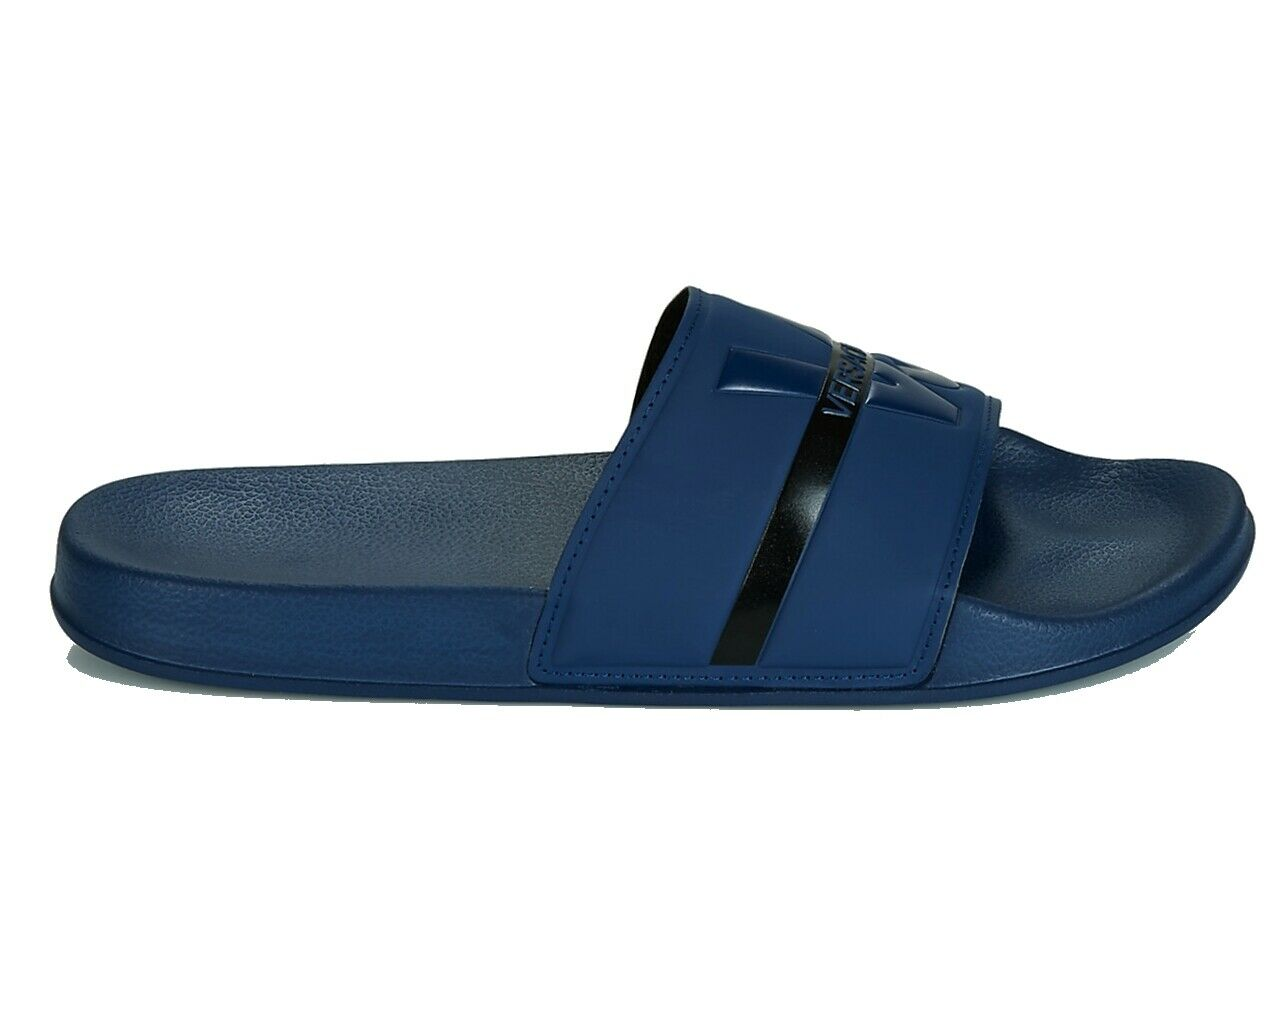 VERSACE Jeans gtbsq 3 Fund VJ cursors Navy Summer Sandals Beach Pool